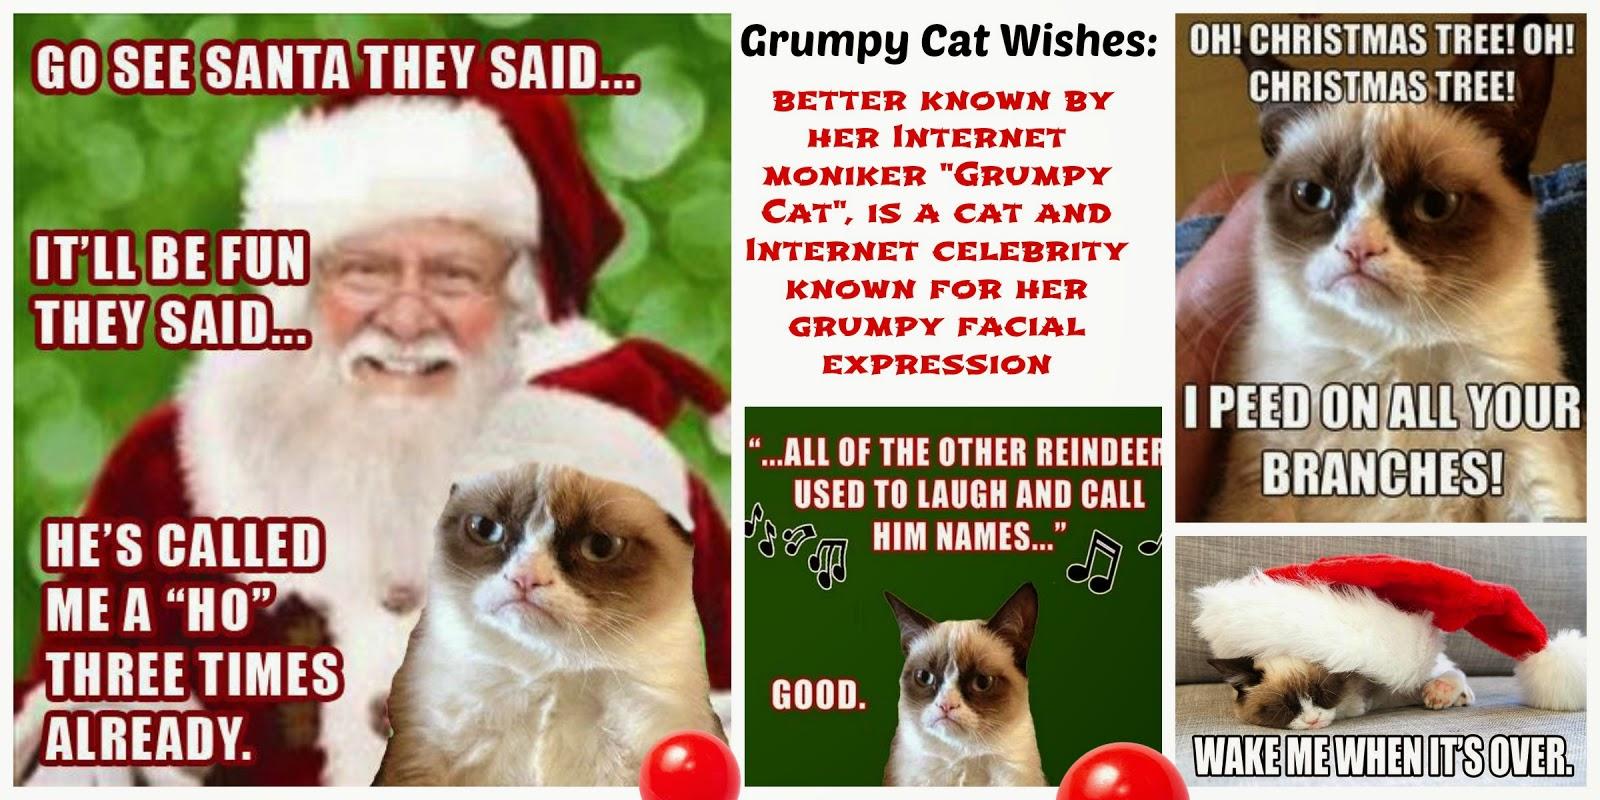 Christmas tree grumpy cat